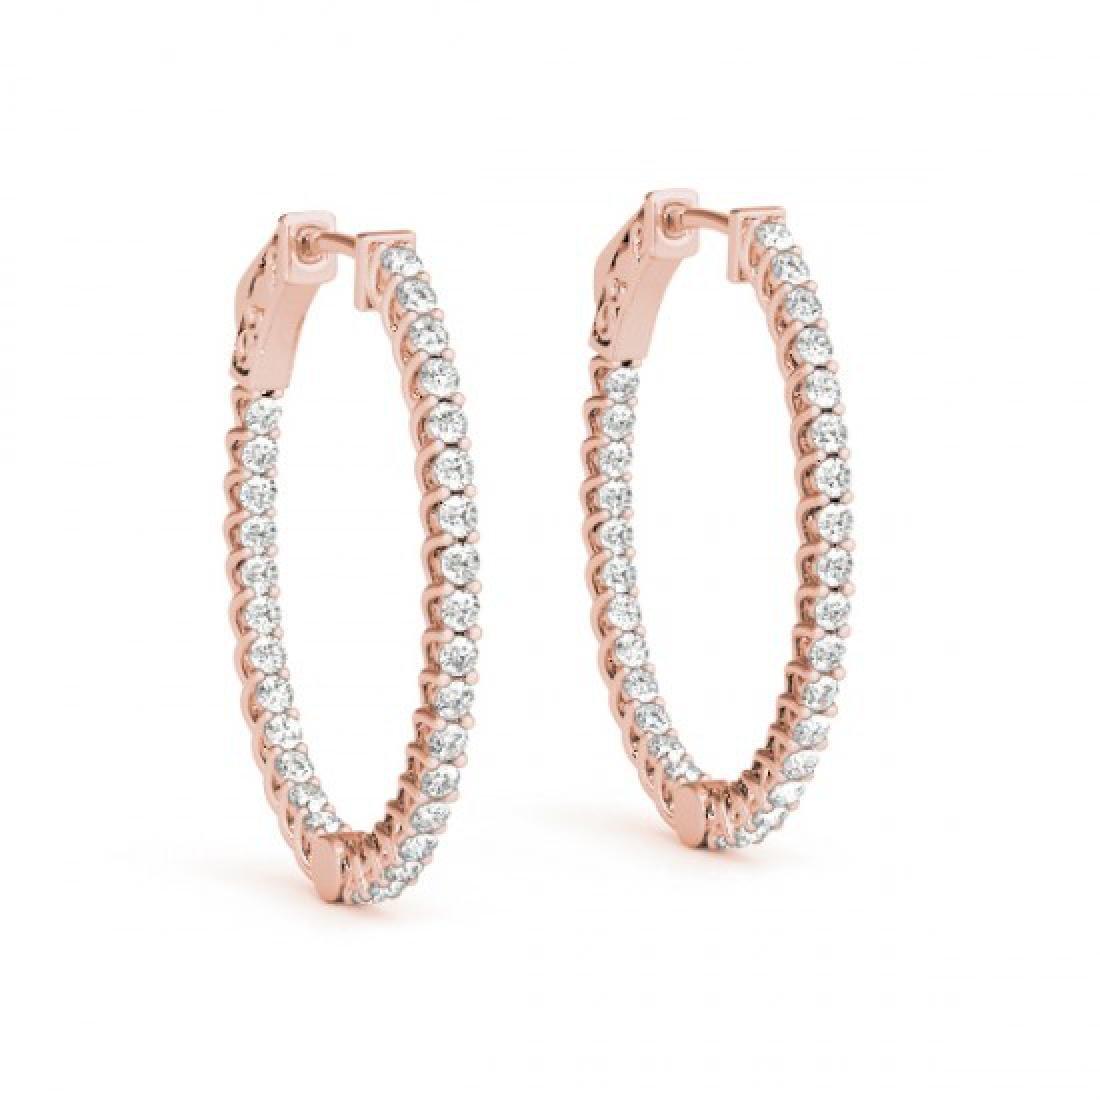 2.5 CTW Diamond VS/SI Certified 36 Mm Hoop Earrings 14K - 2